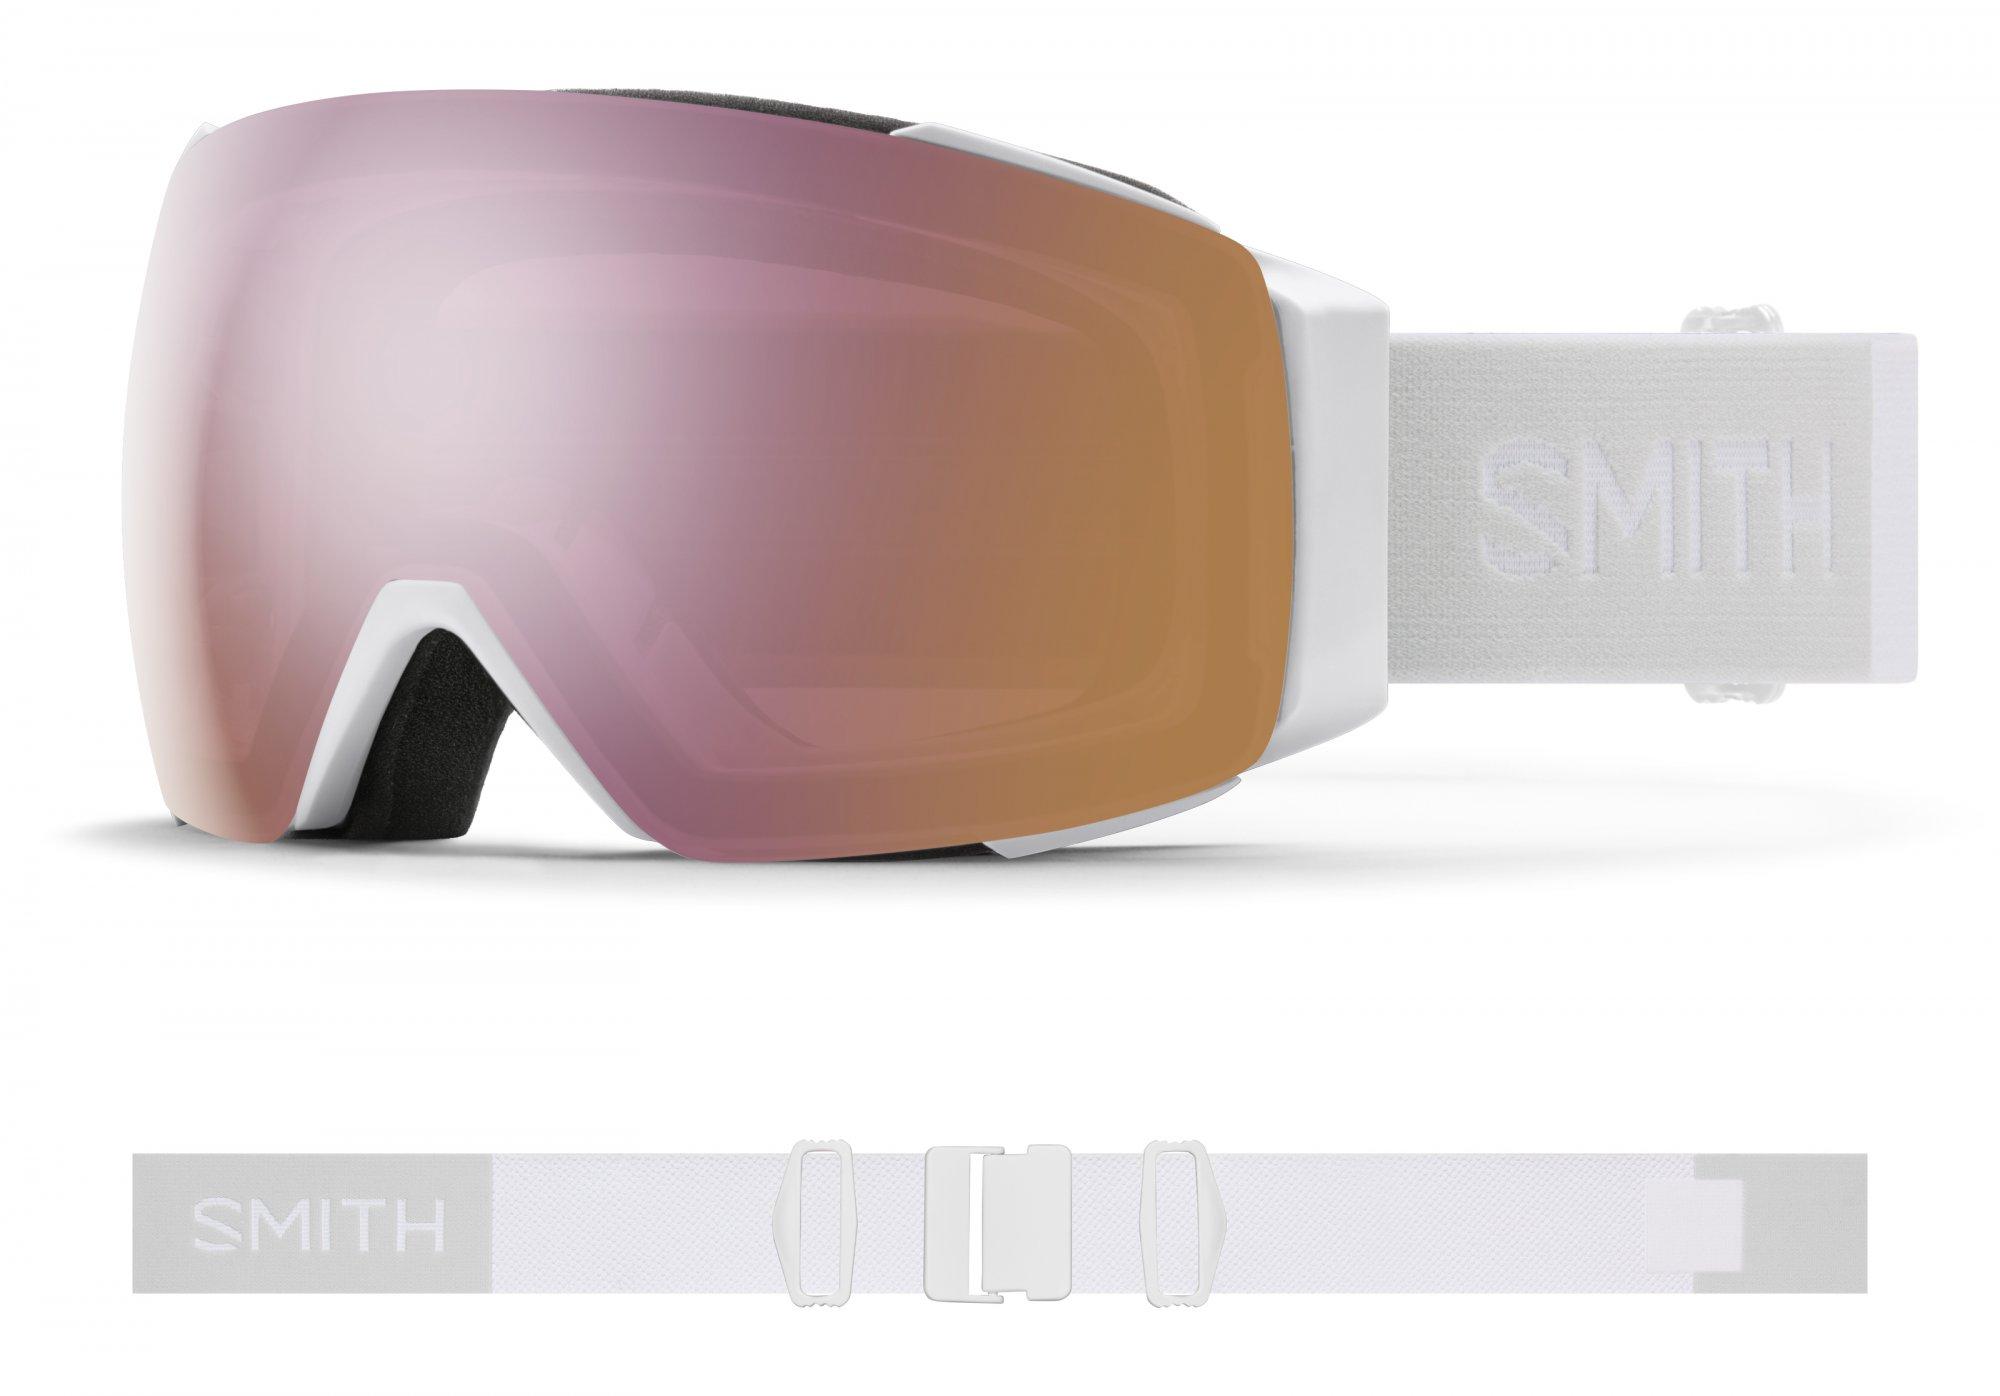 2022 Smith I/O MAG Snow Goggle